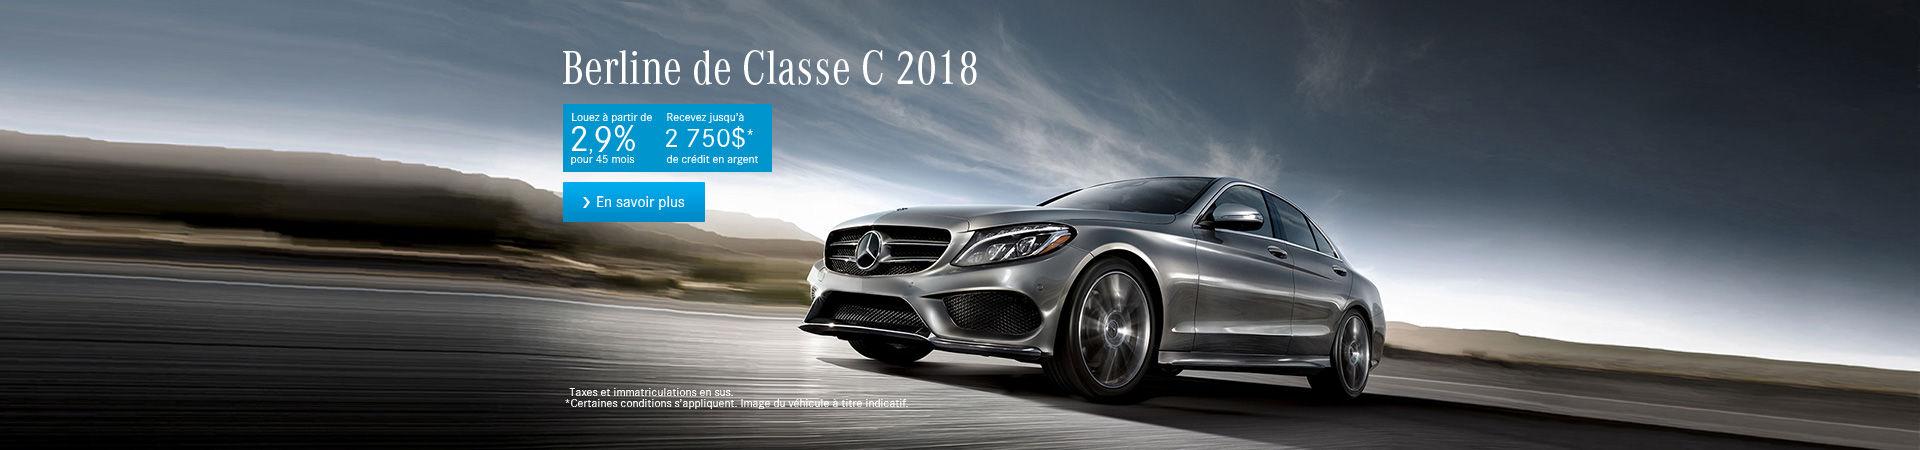 C300 2018 - Header